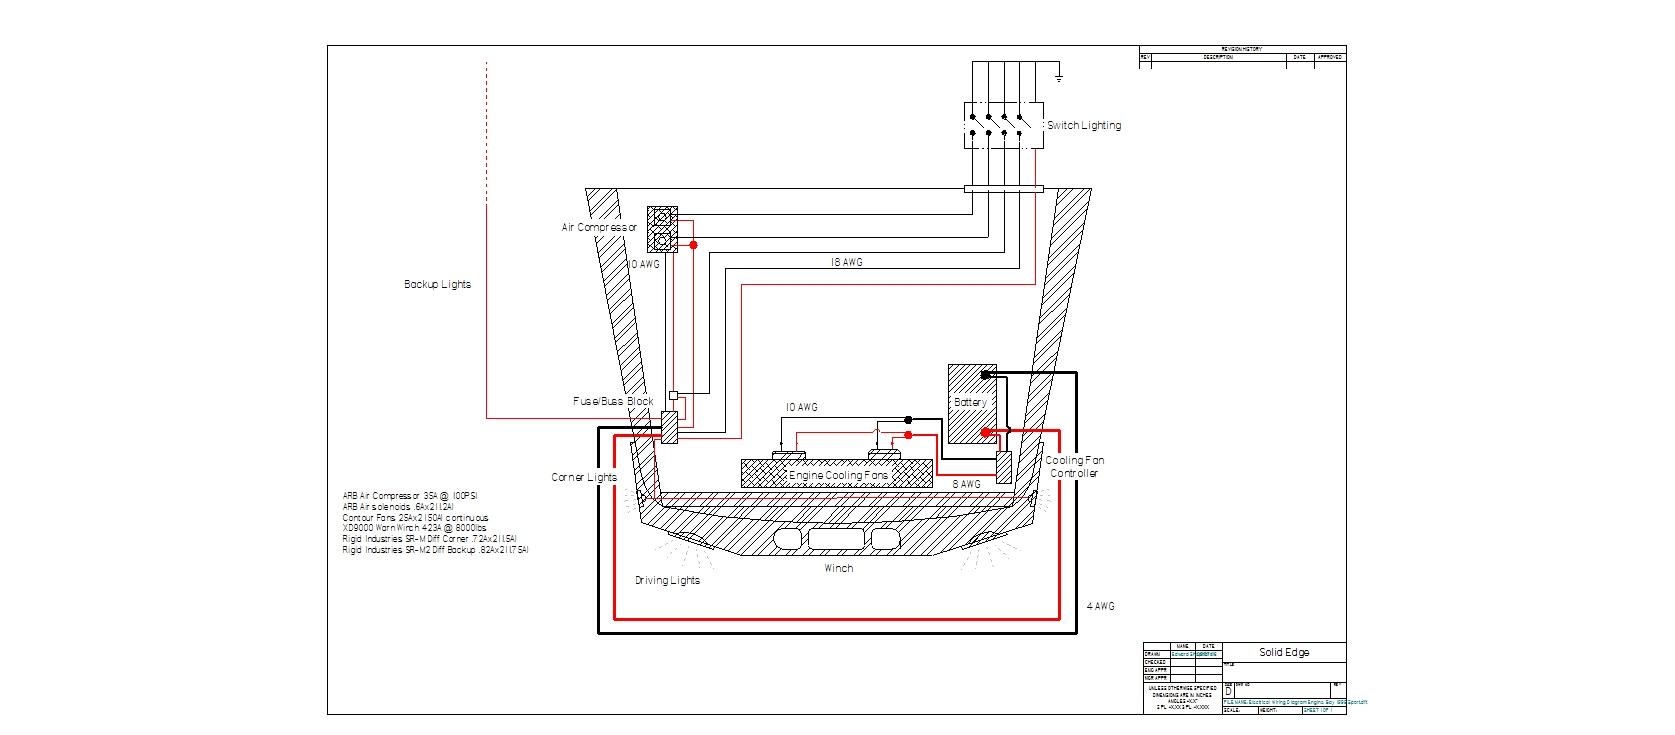 hight resolution of 100 watt metal halide ballast wiring diagram 3 phase